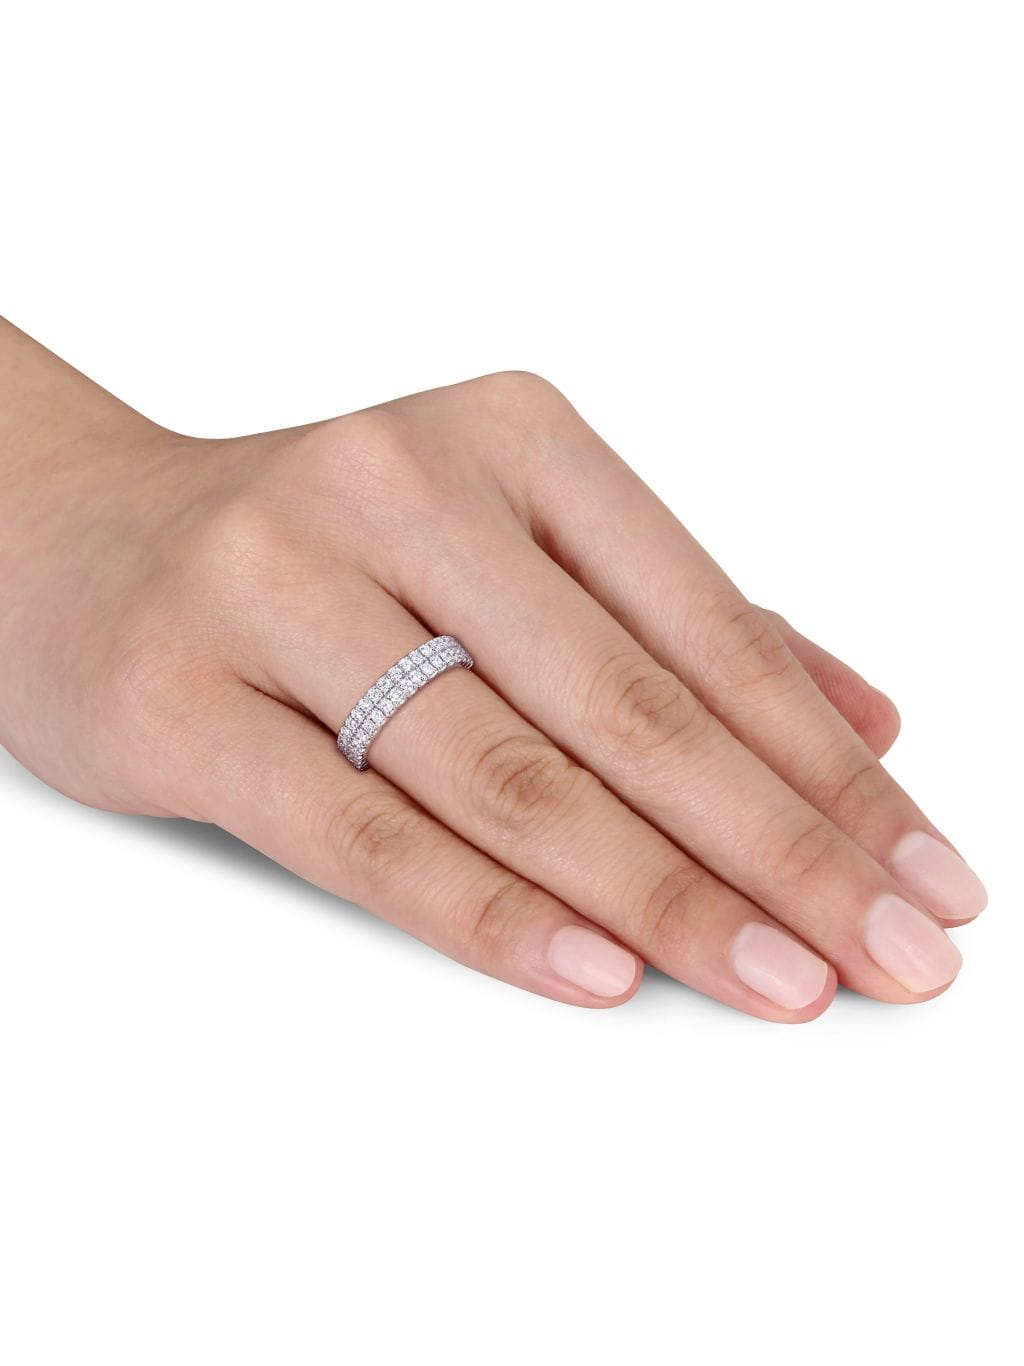 Saks Fifth Avenue 14K White Gold & Diamond Double-Row Eternity Ring